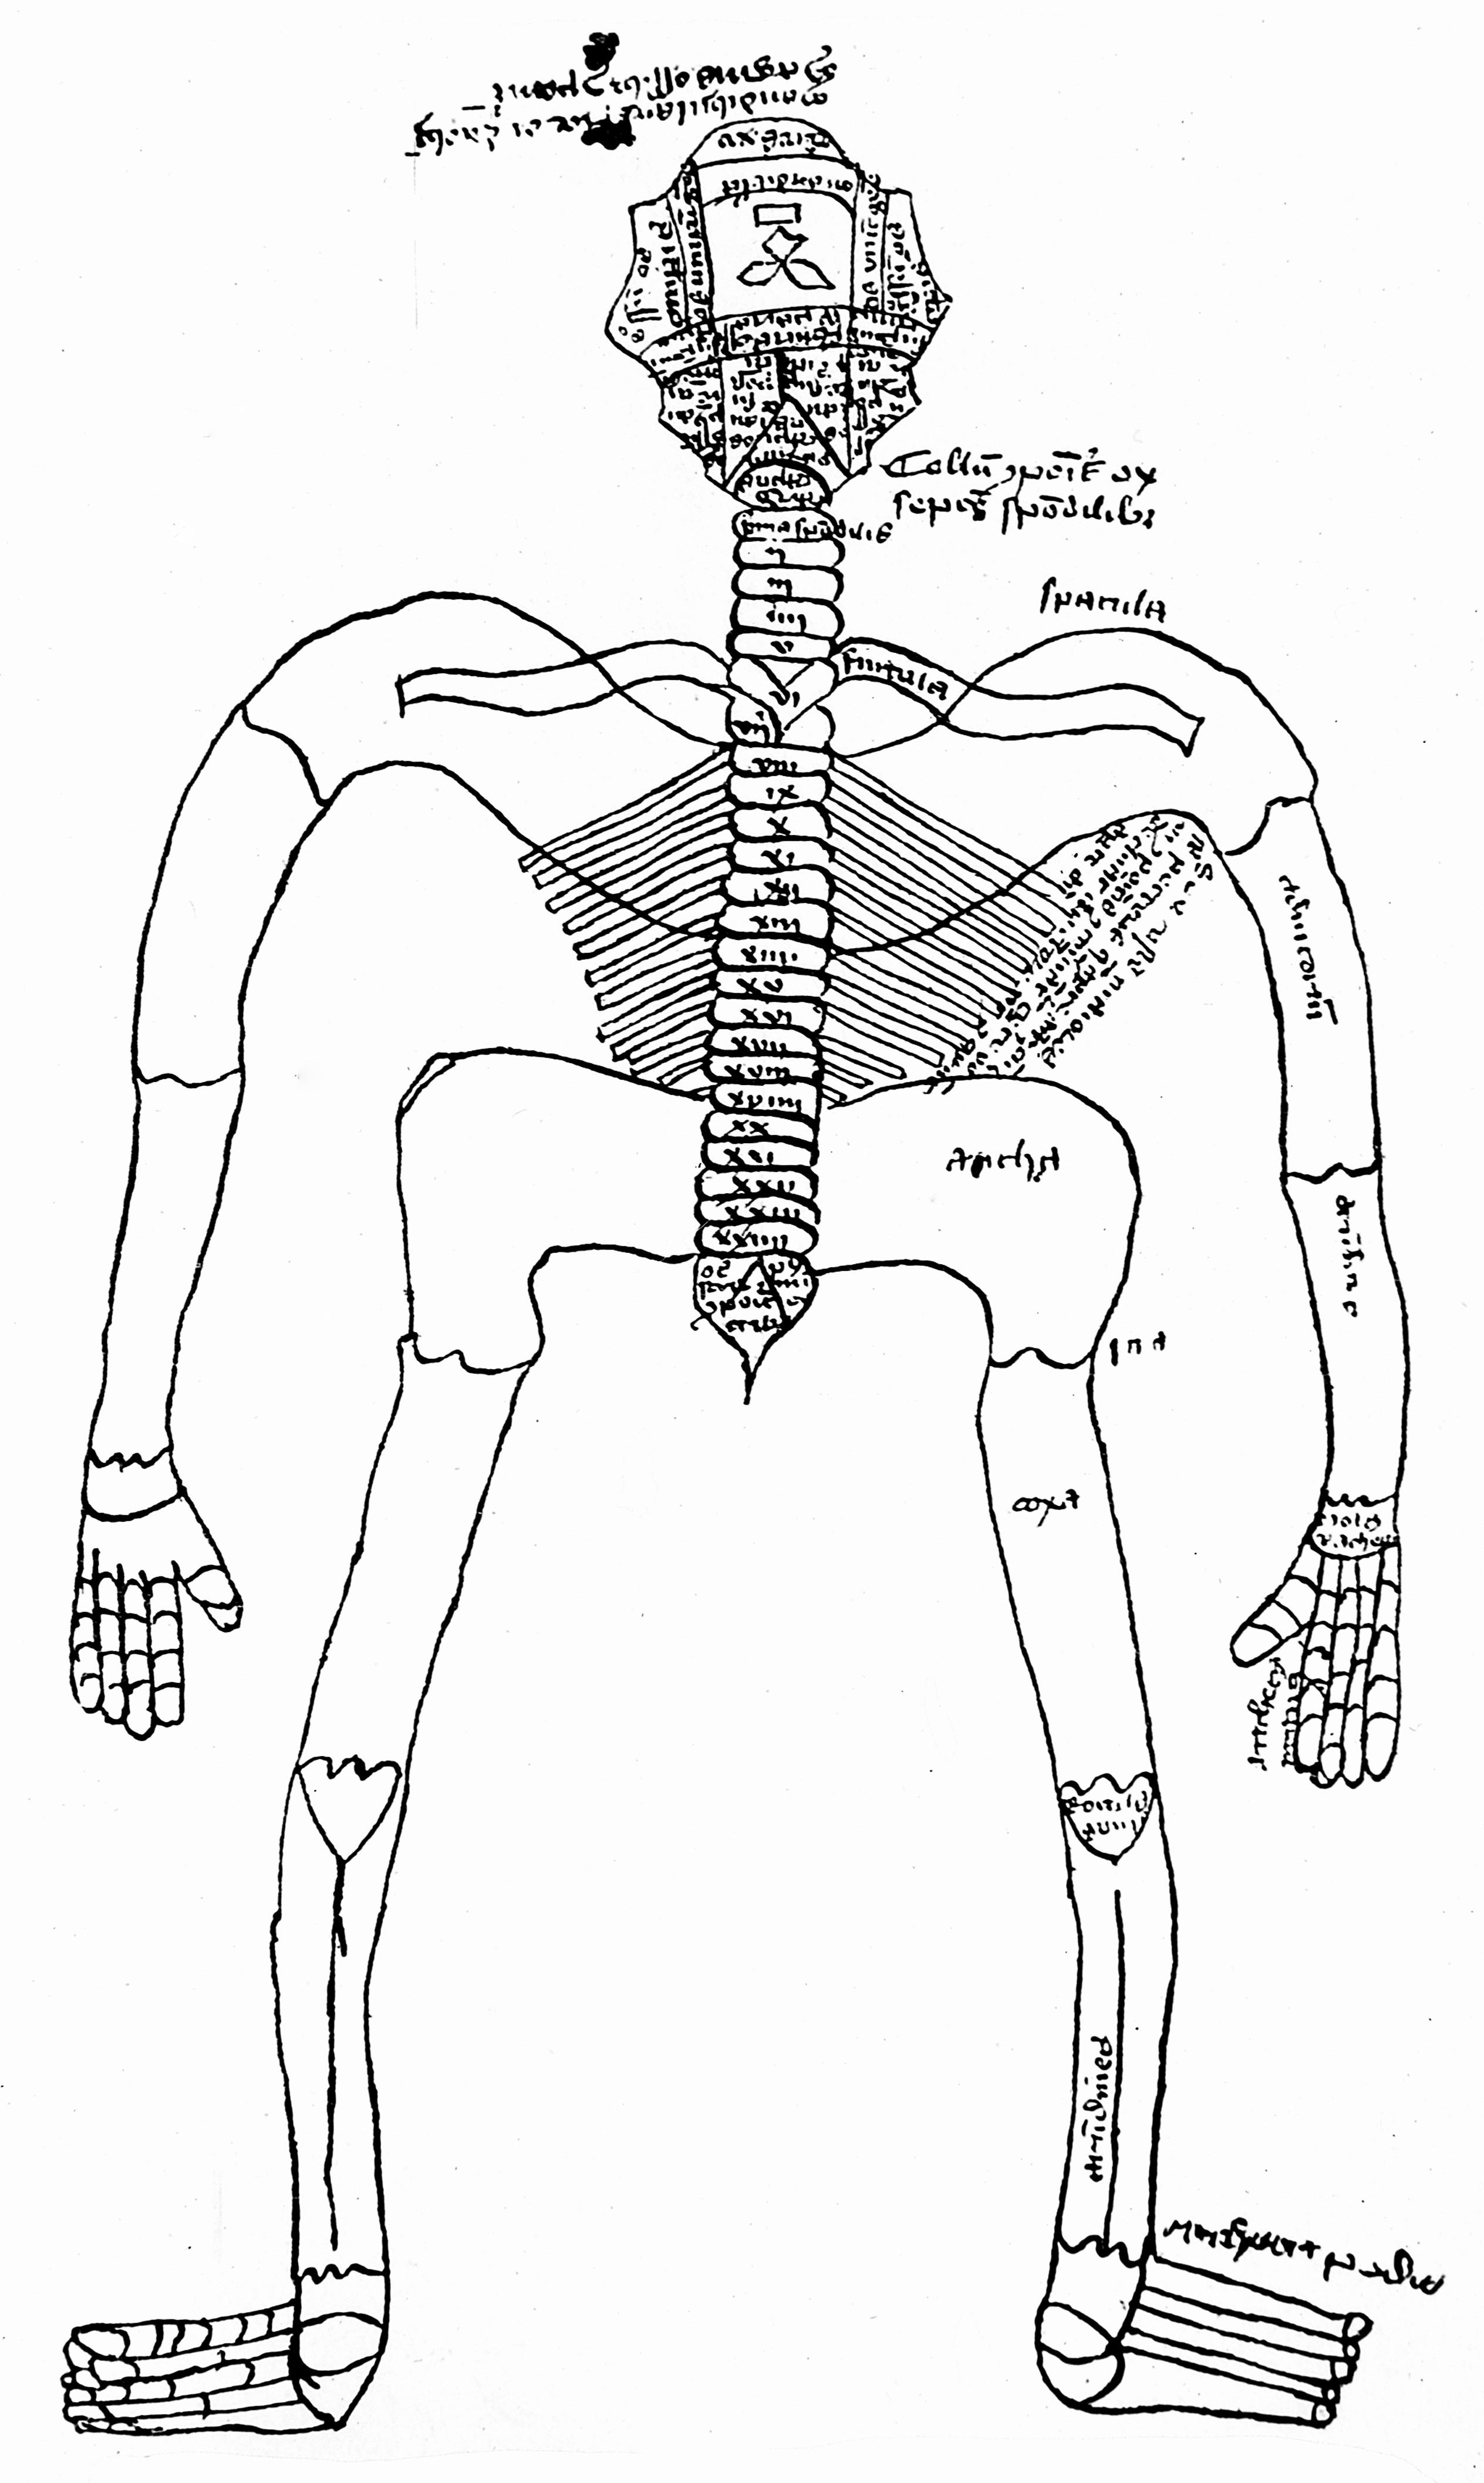 Fileskeleton 14th Century Wellcome M0000410g Wikimedia Commons